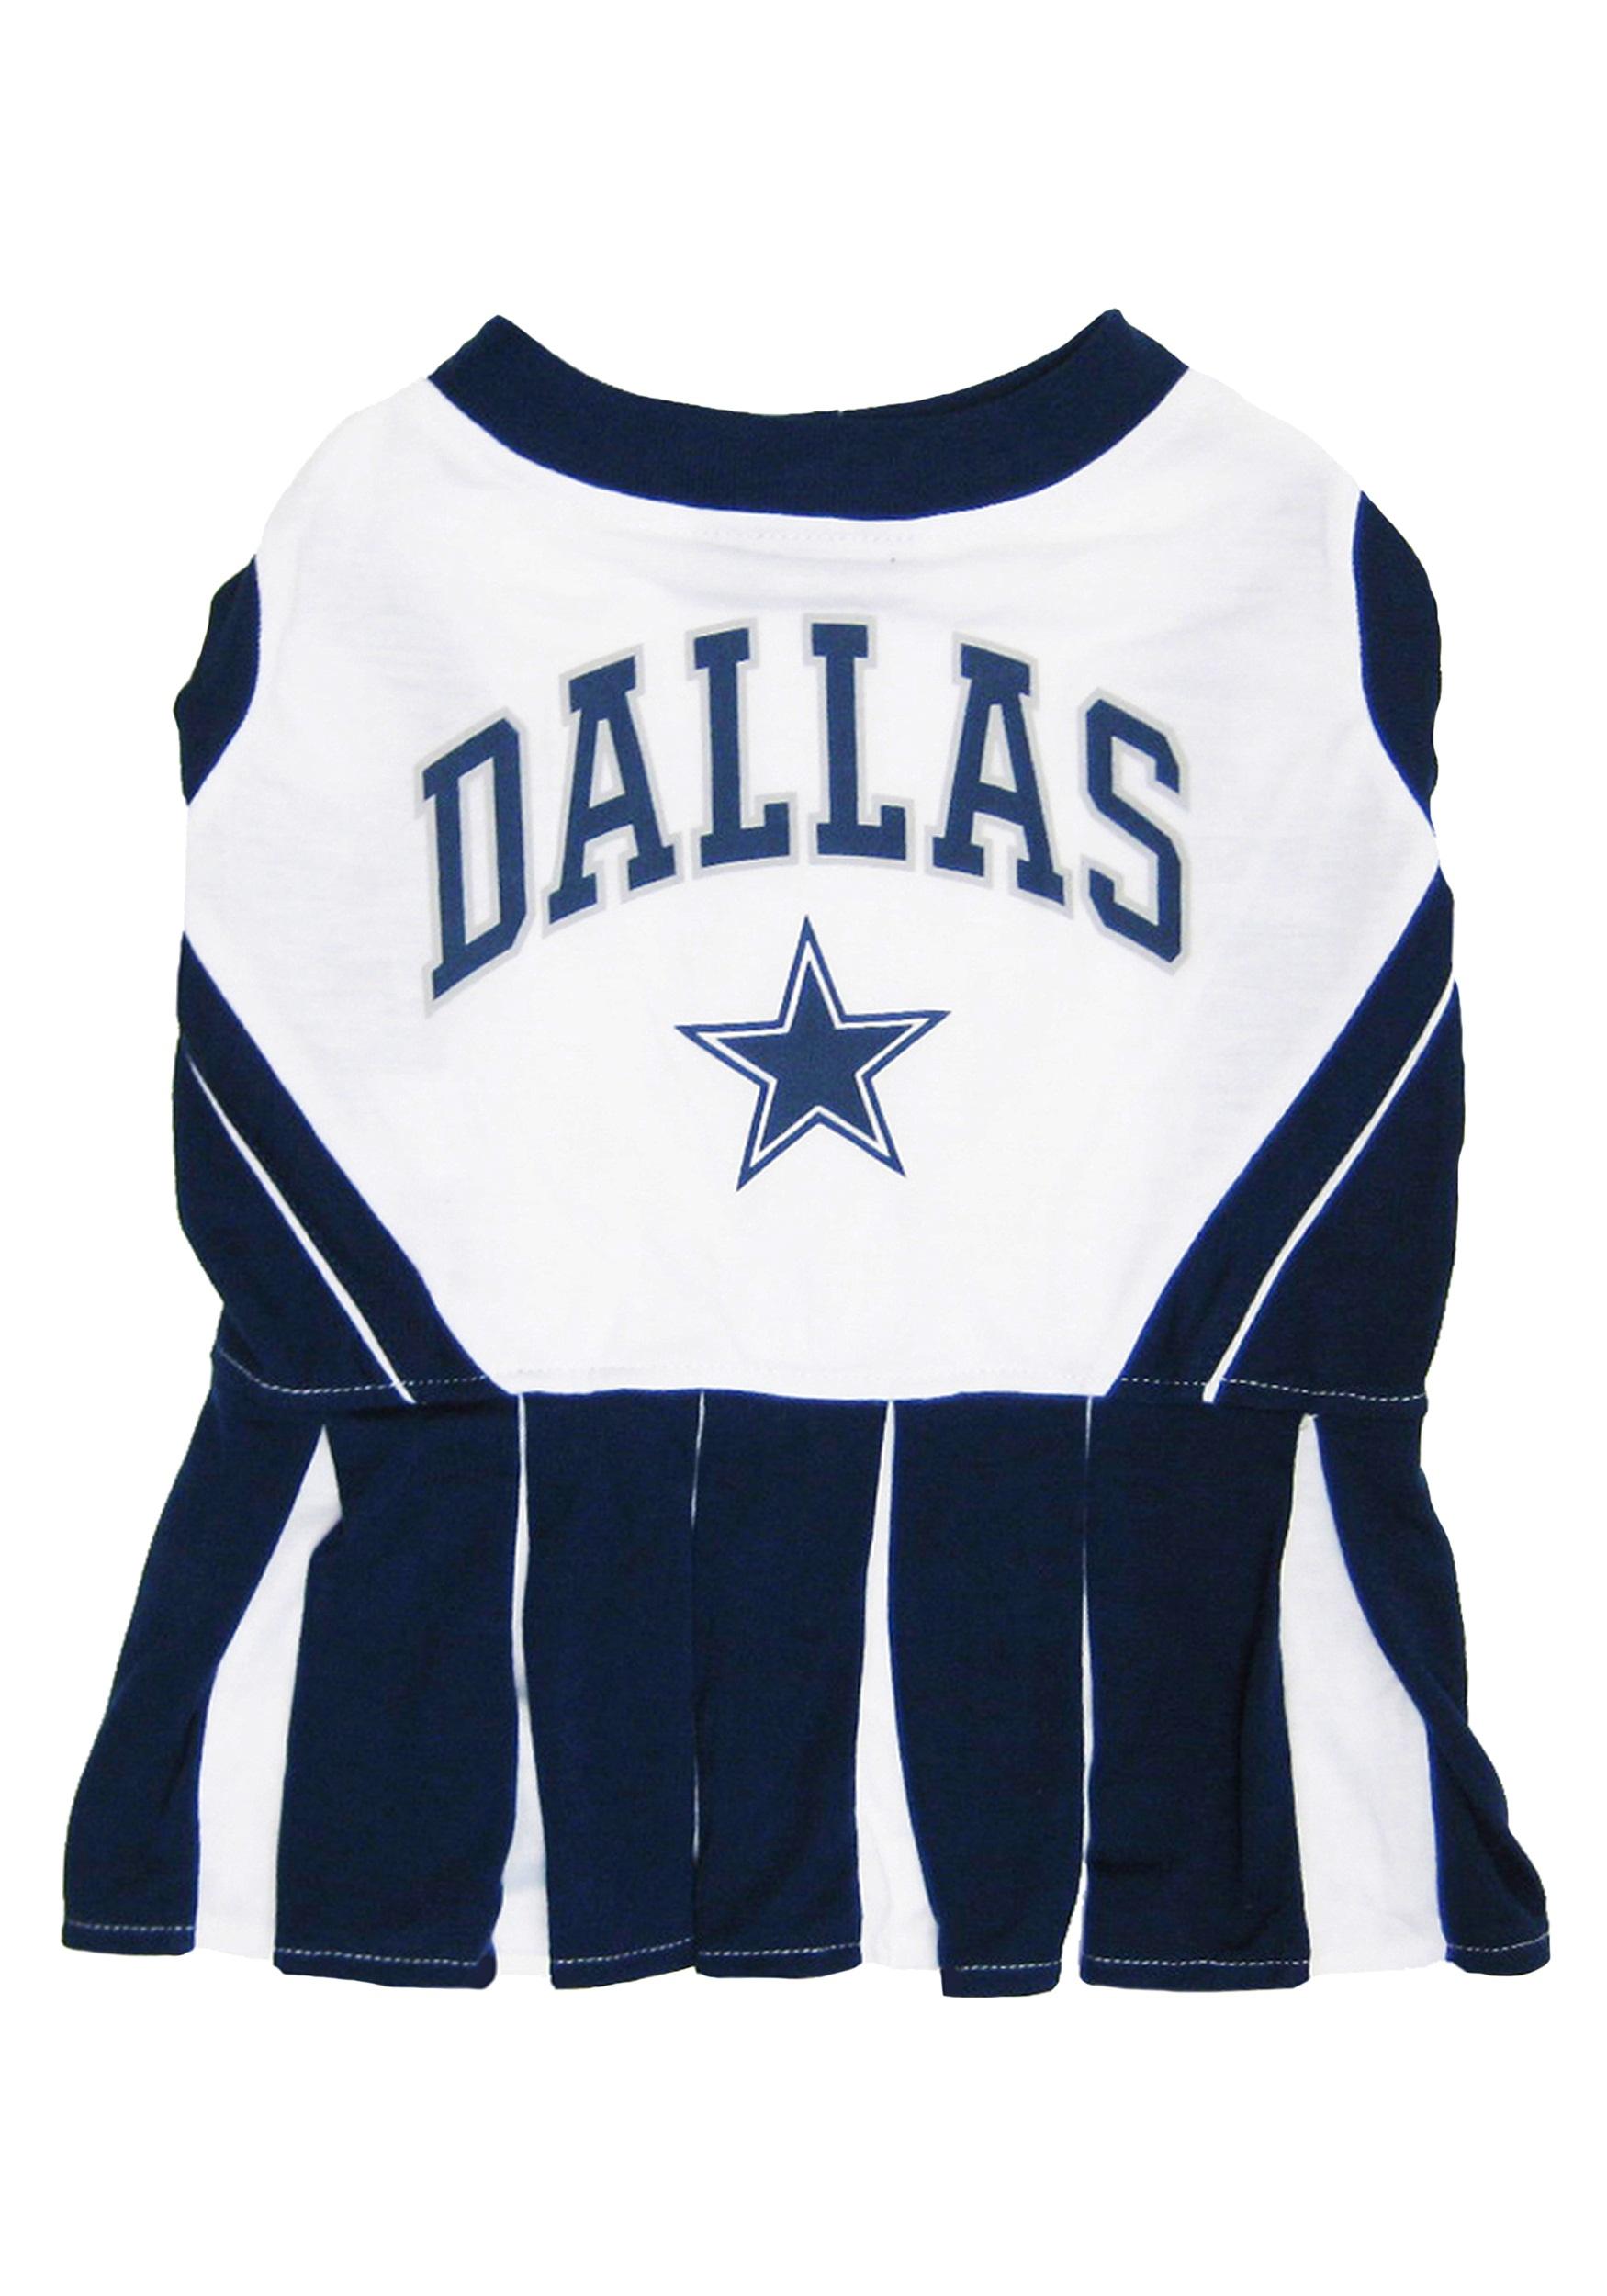 Dallas Cowboys Dog Cheerleader Outfit Halloween Costumes